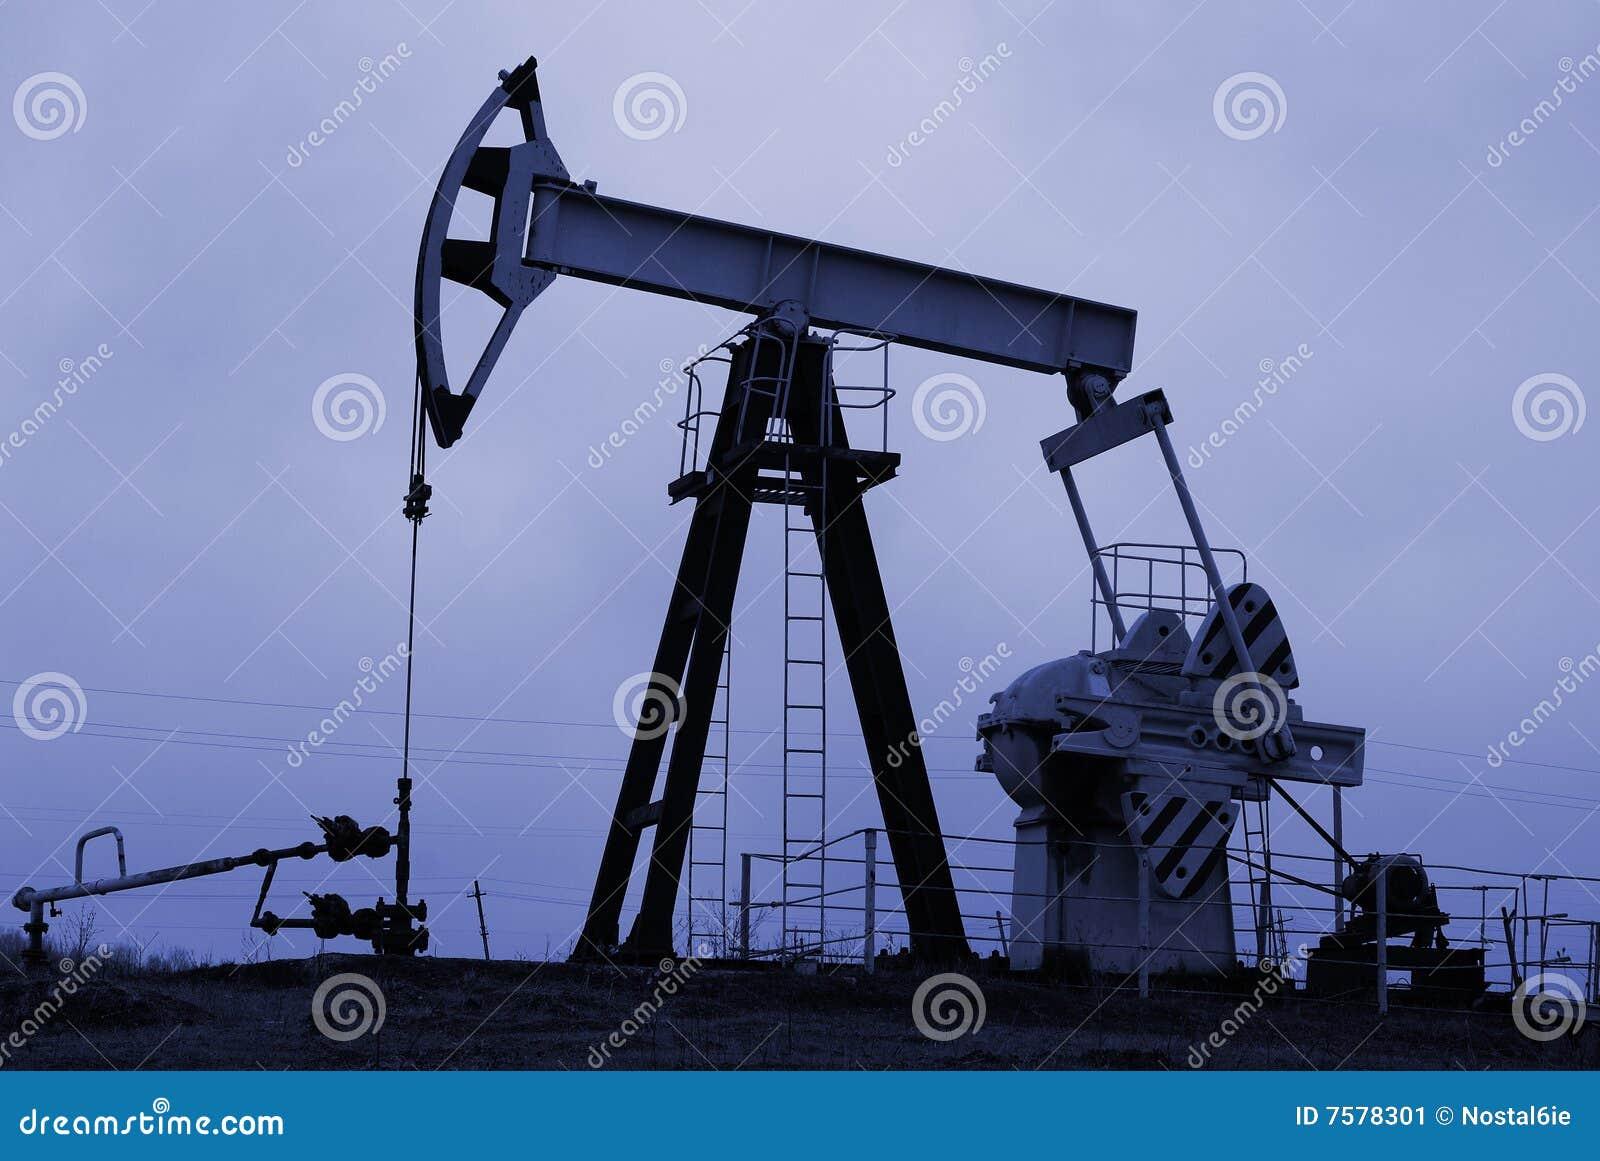 Industriële oliepomp